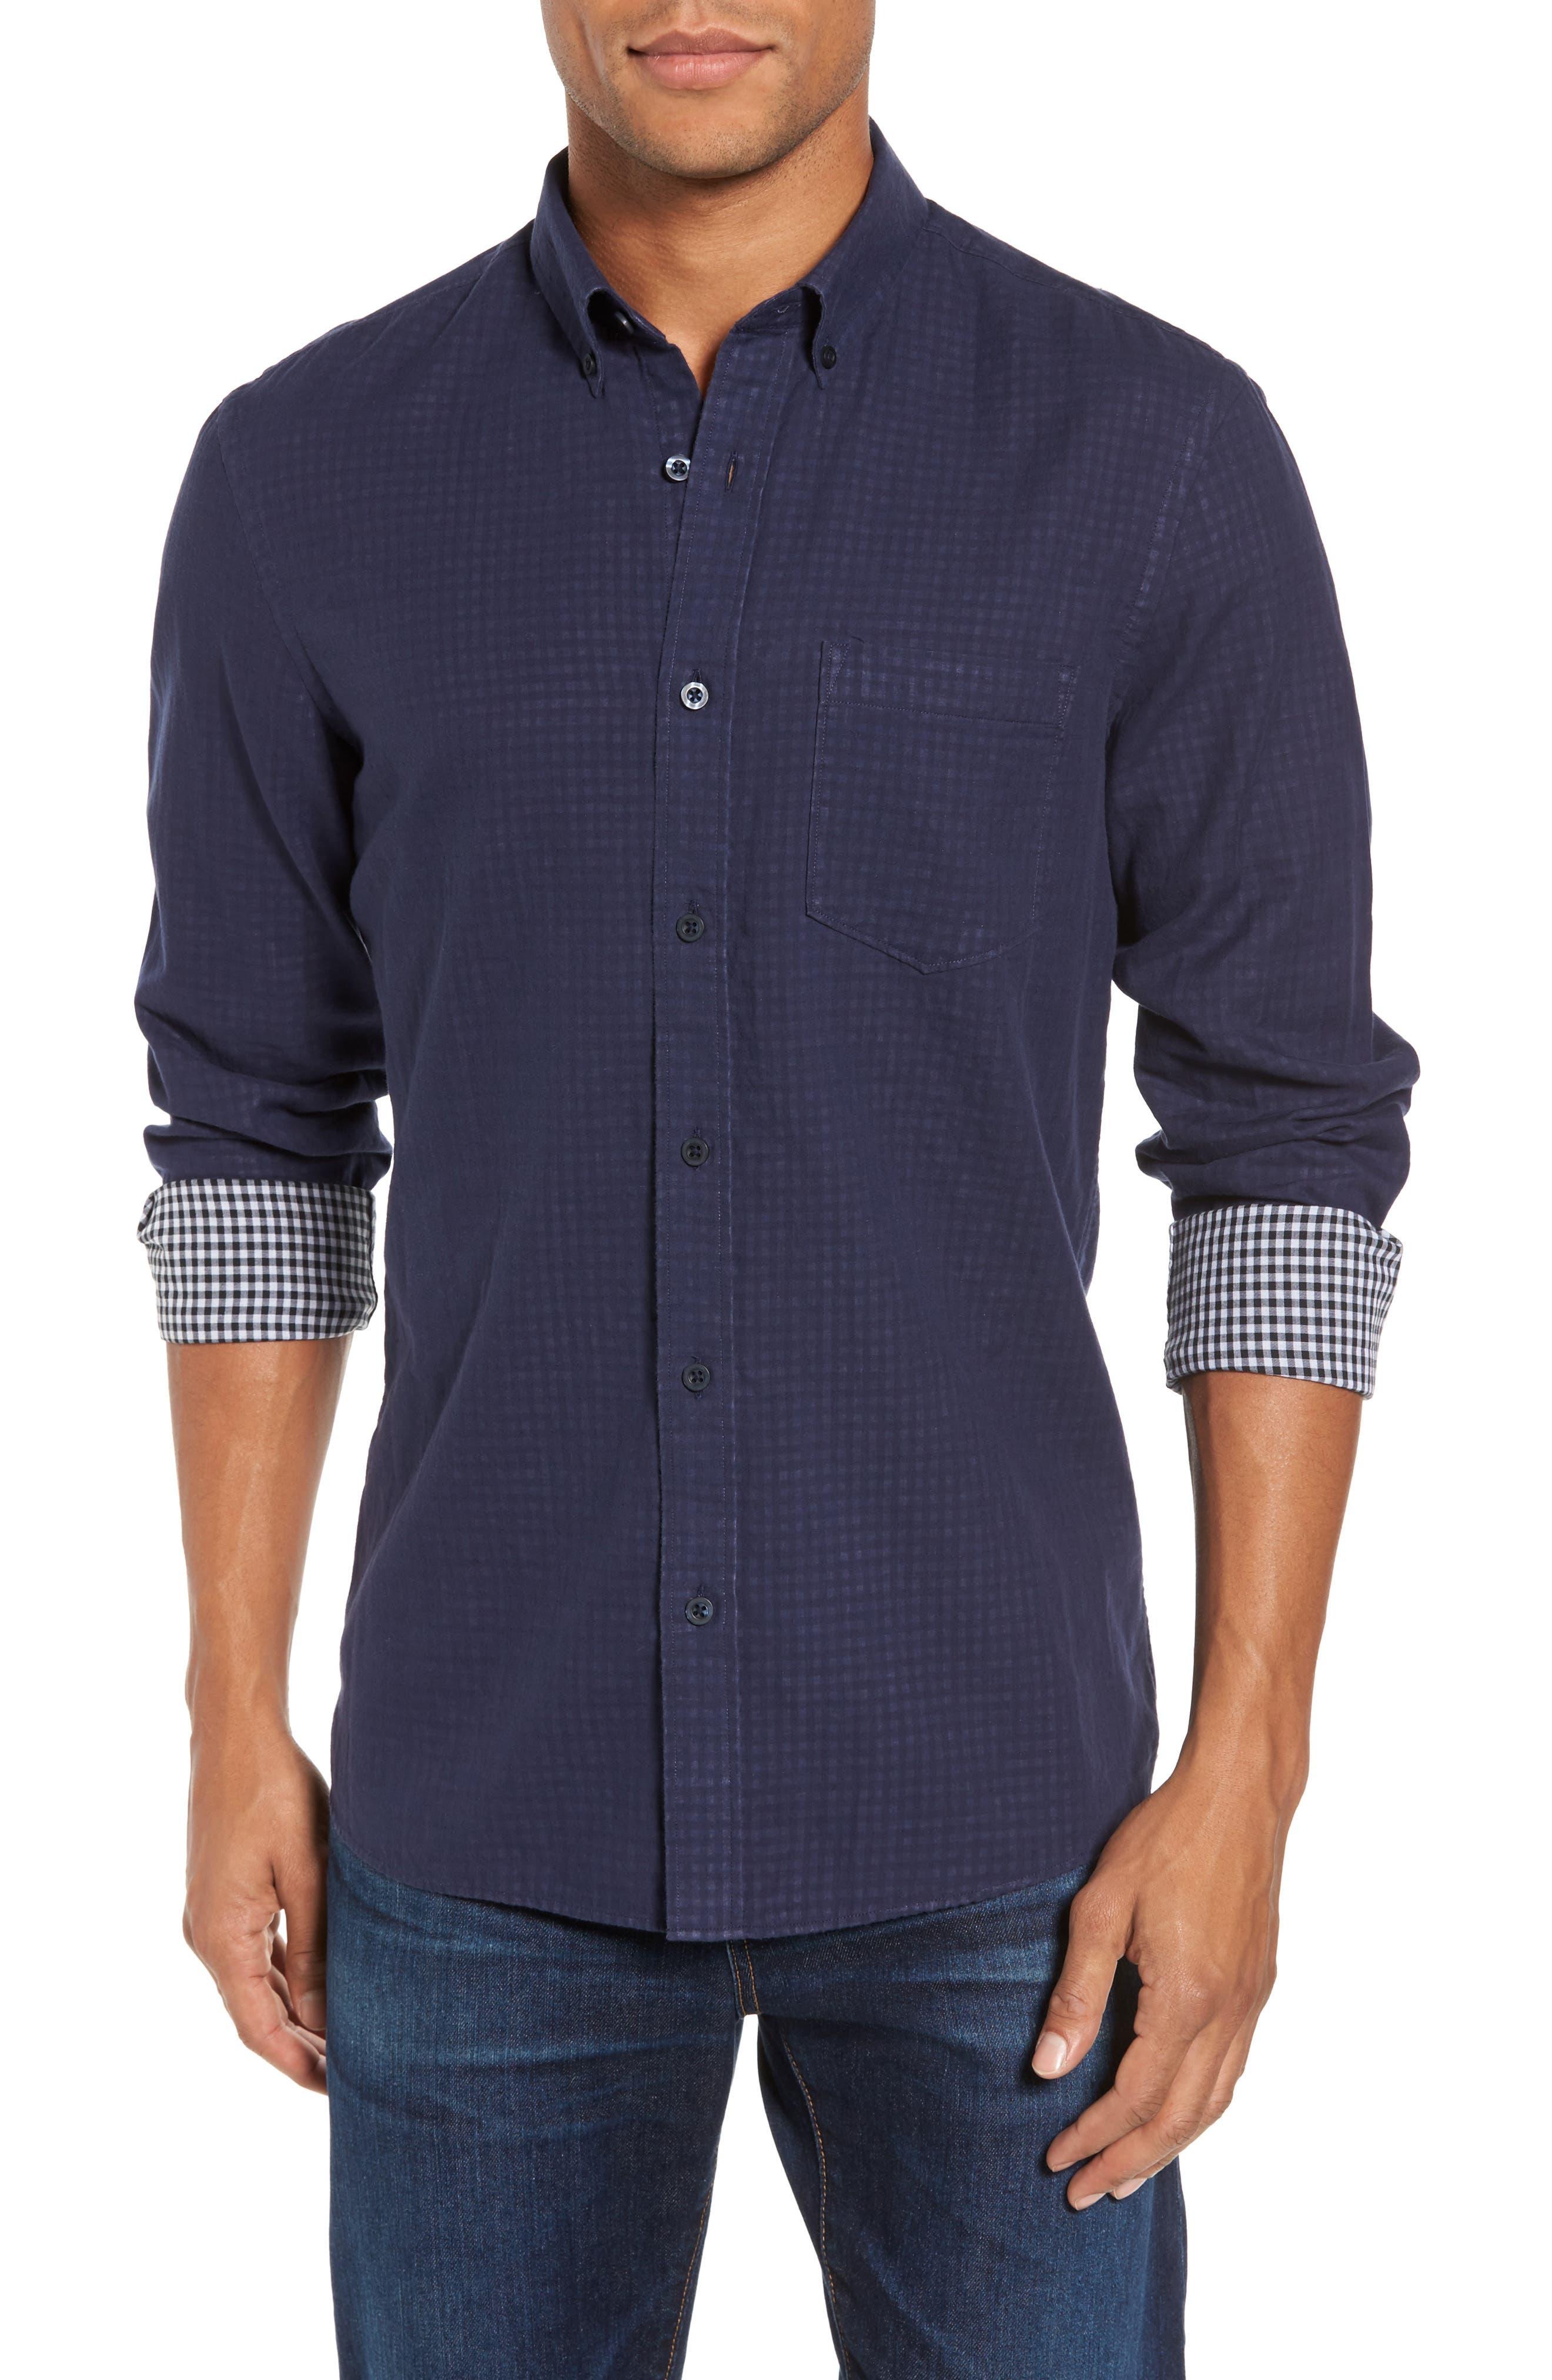 Trim Fit Duofold Sport Shirt,                             Main thumbnail 1, color,                             Navy Iris Gingham Duofold